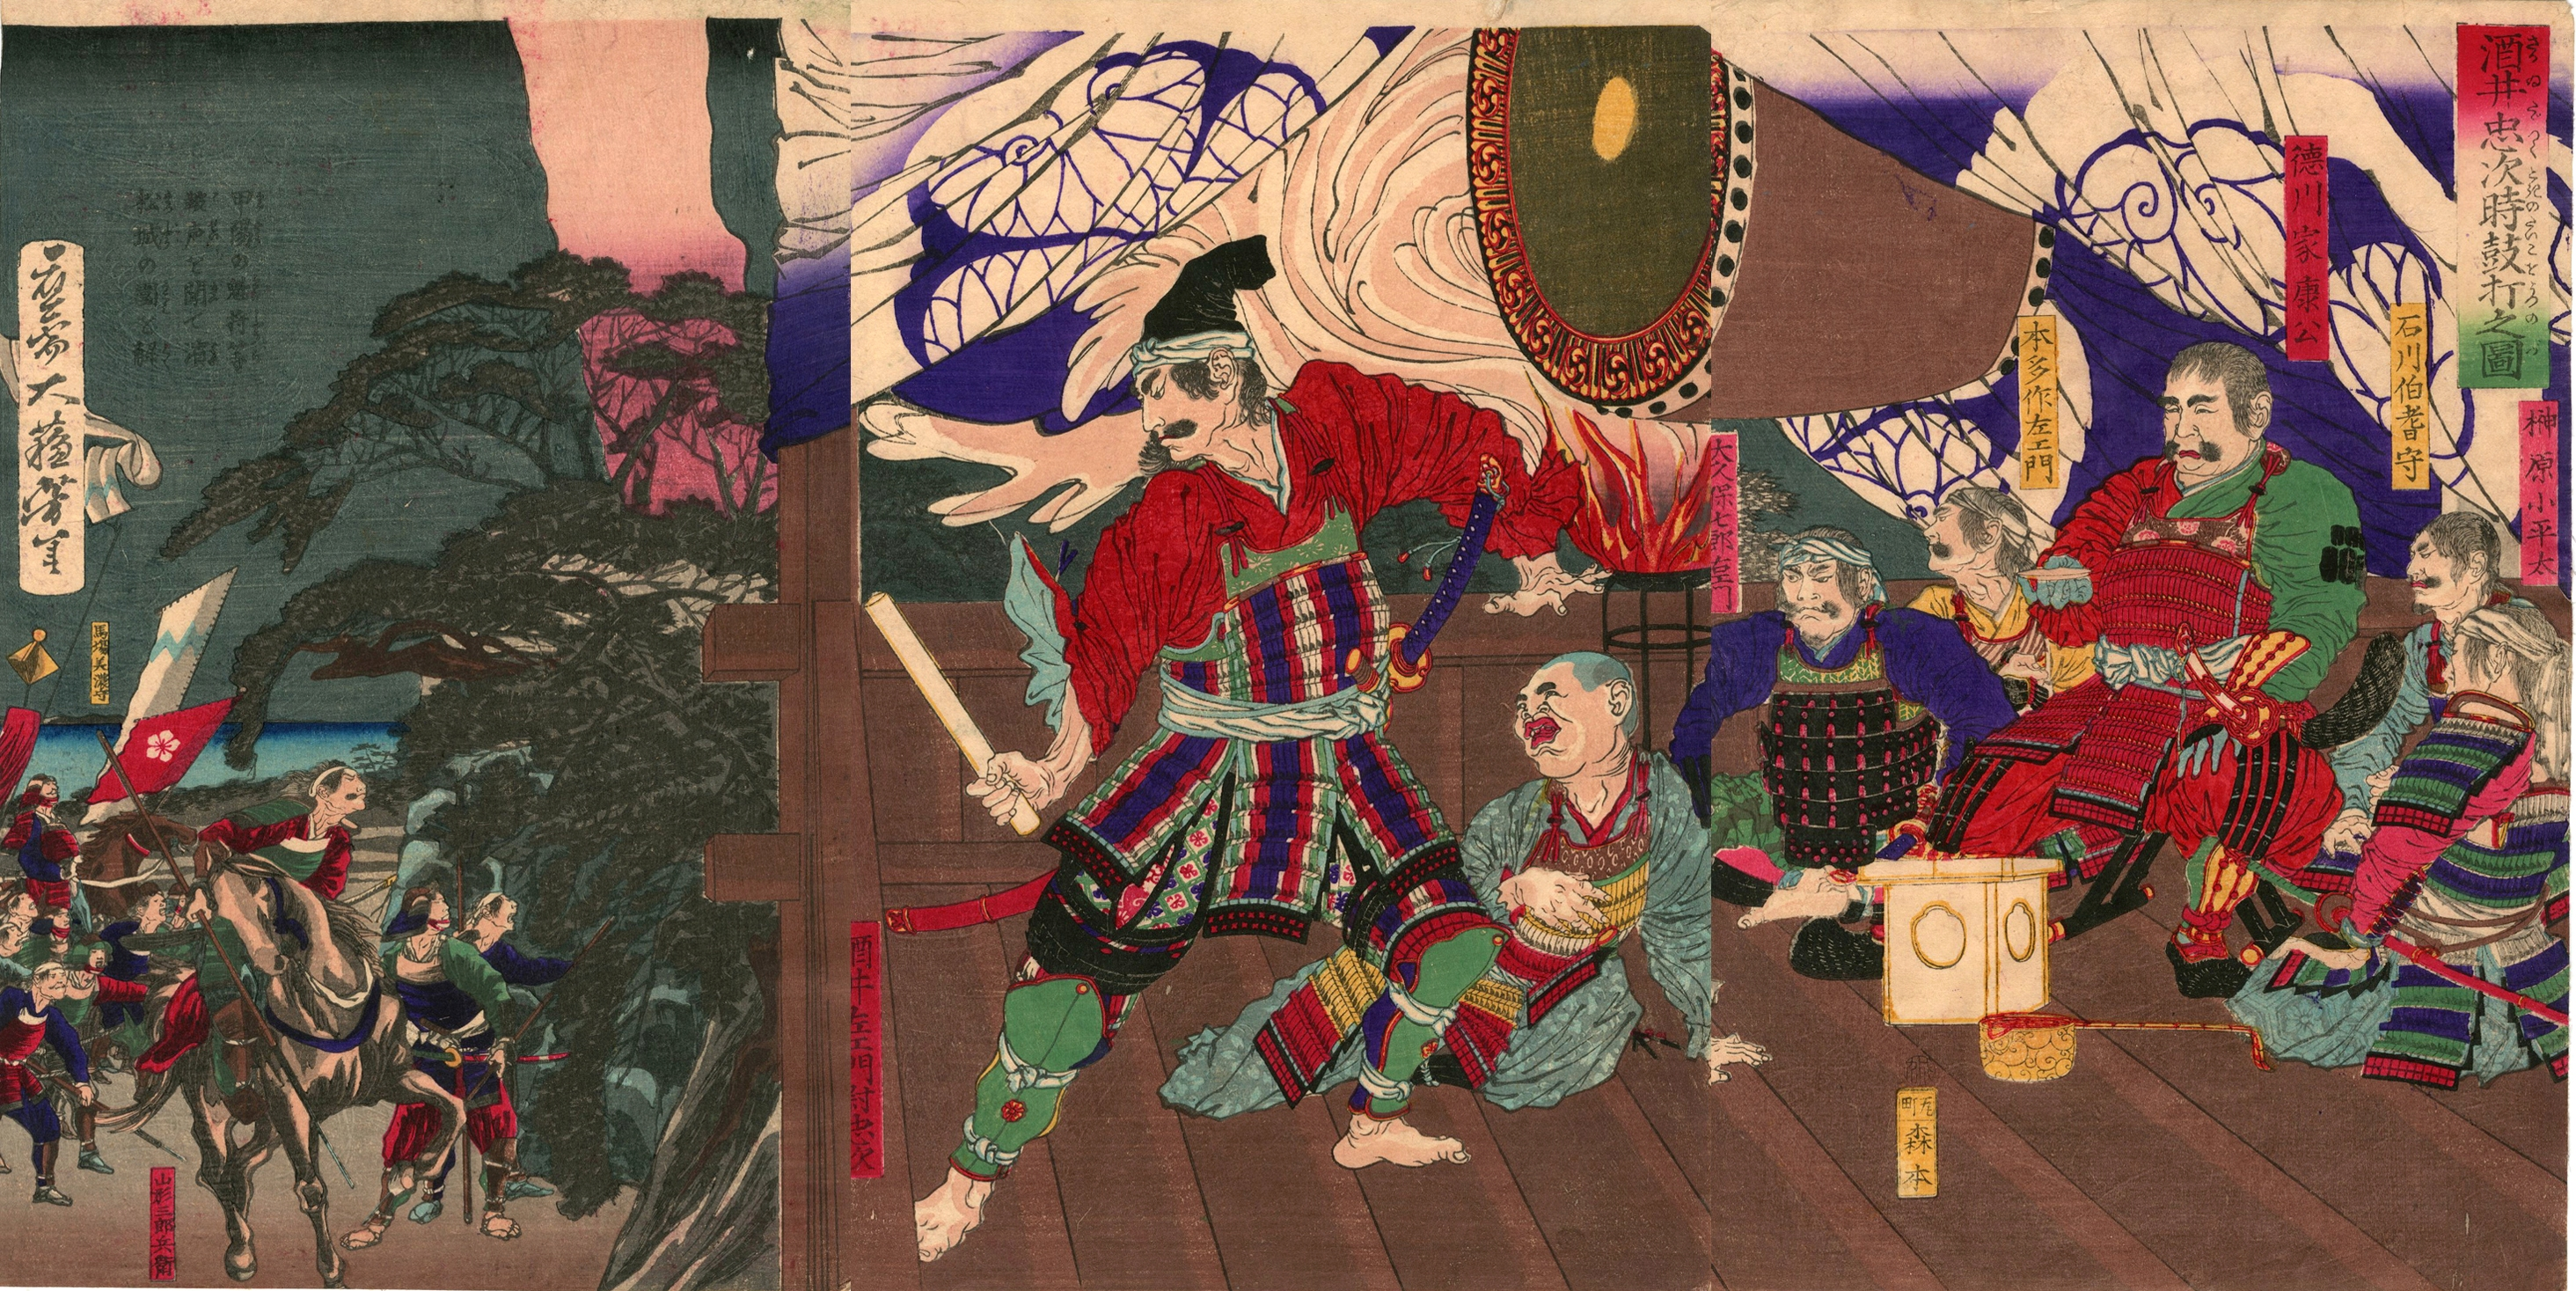 File:Sakai Tadatsugu's drum.jpg - Wikimedia Commons